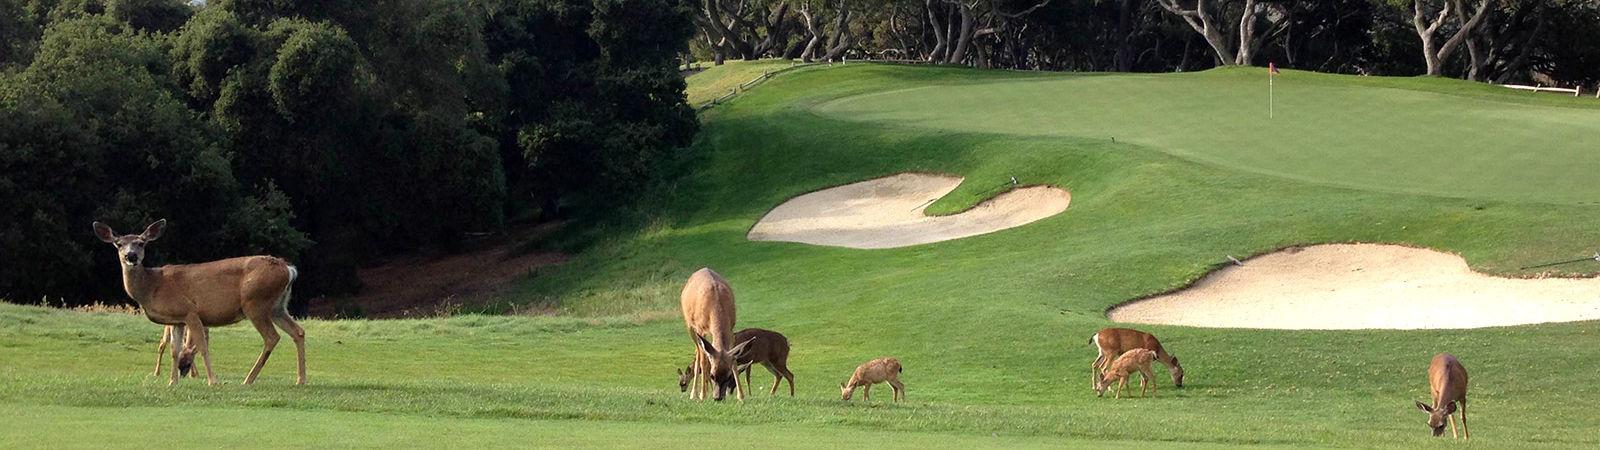 Golf-Services